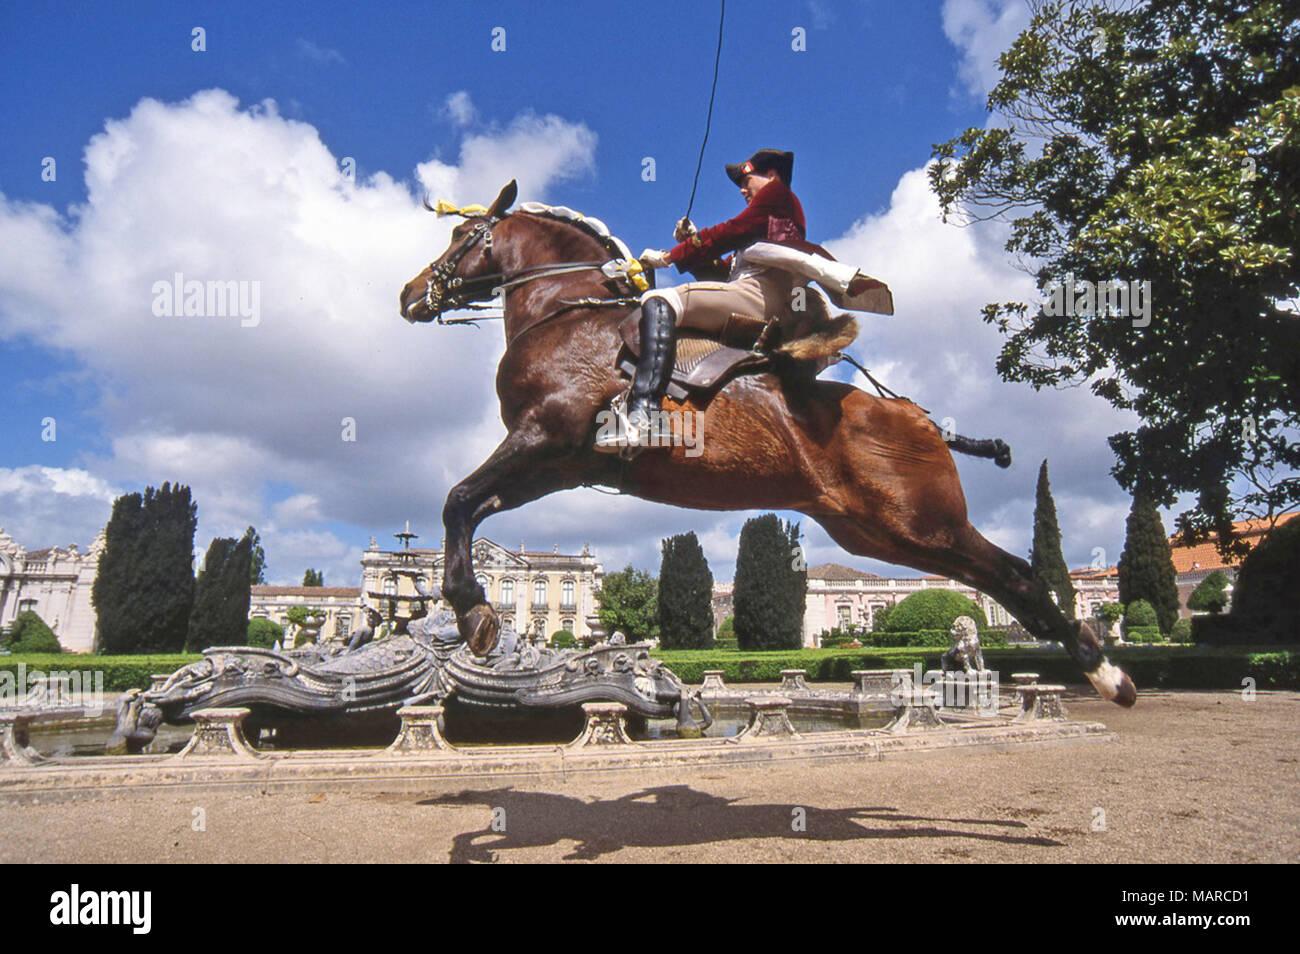 Alter Real. Bay avec adultes effectuant un cavalier capriole. Portugal Photo Stock